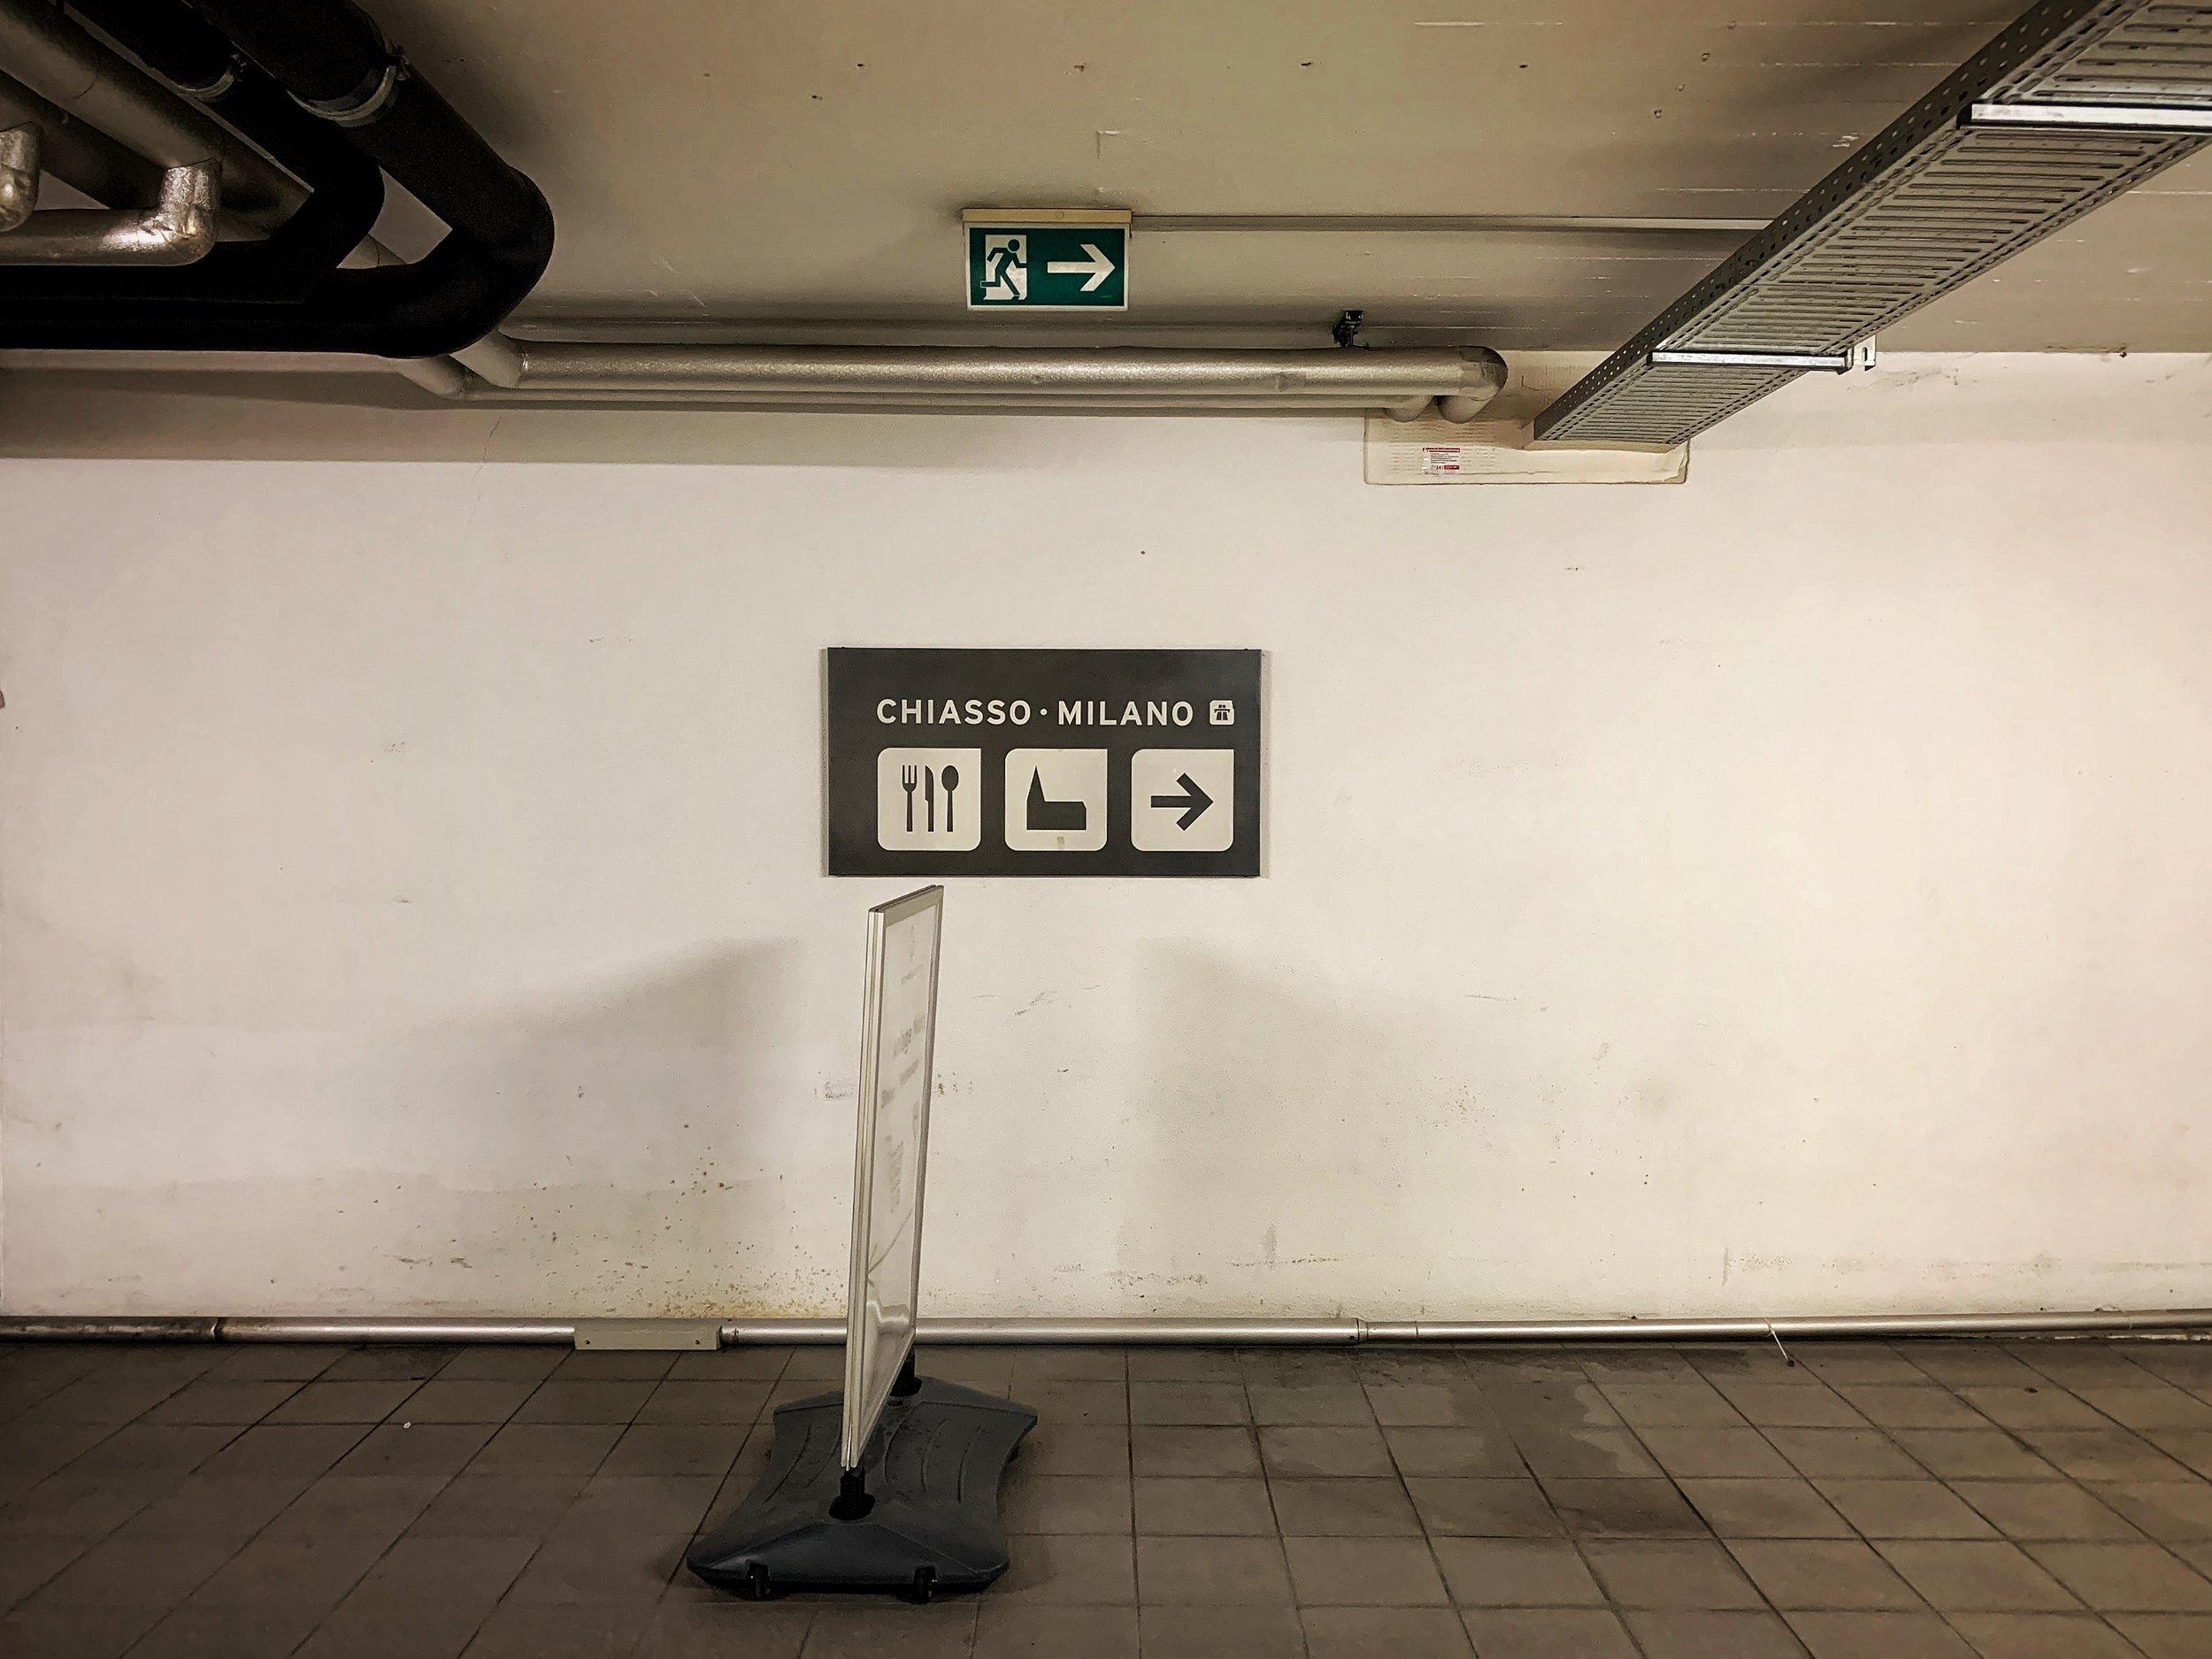 The road to Milan. Photo: (C) Remko Tanis